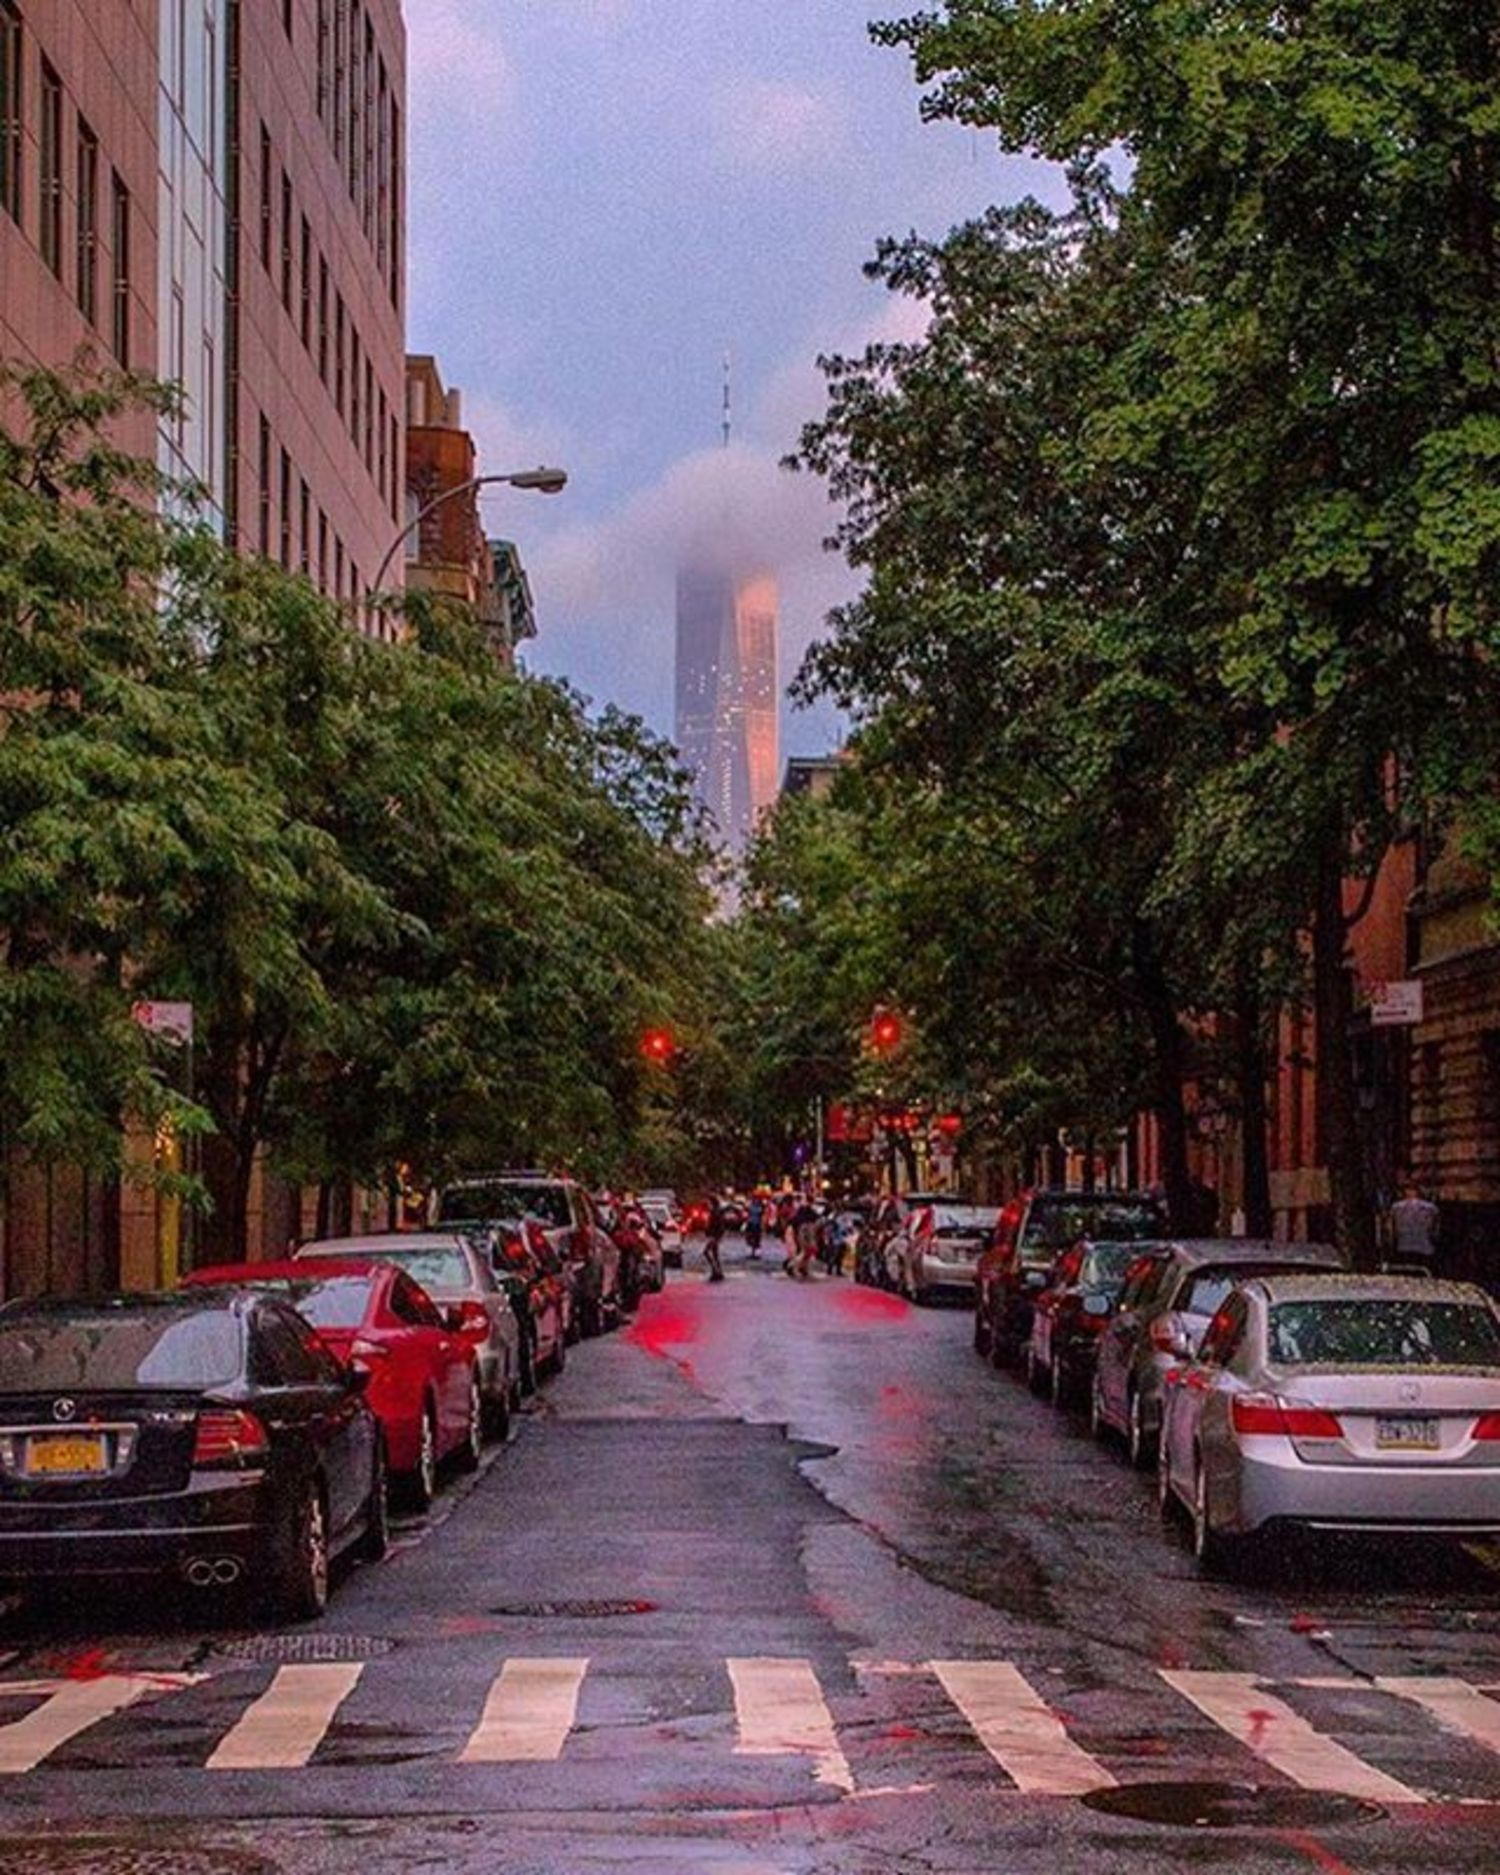 One World Trade Center, New York, New York. Photo via @matthewchimeraphotography #viewingnyc #newyorkcity #newyork